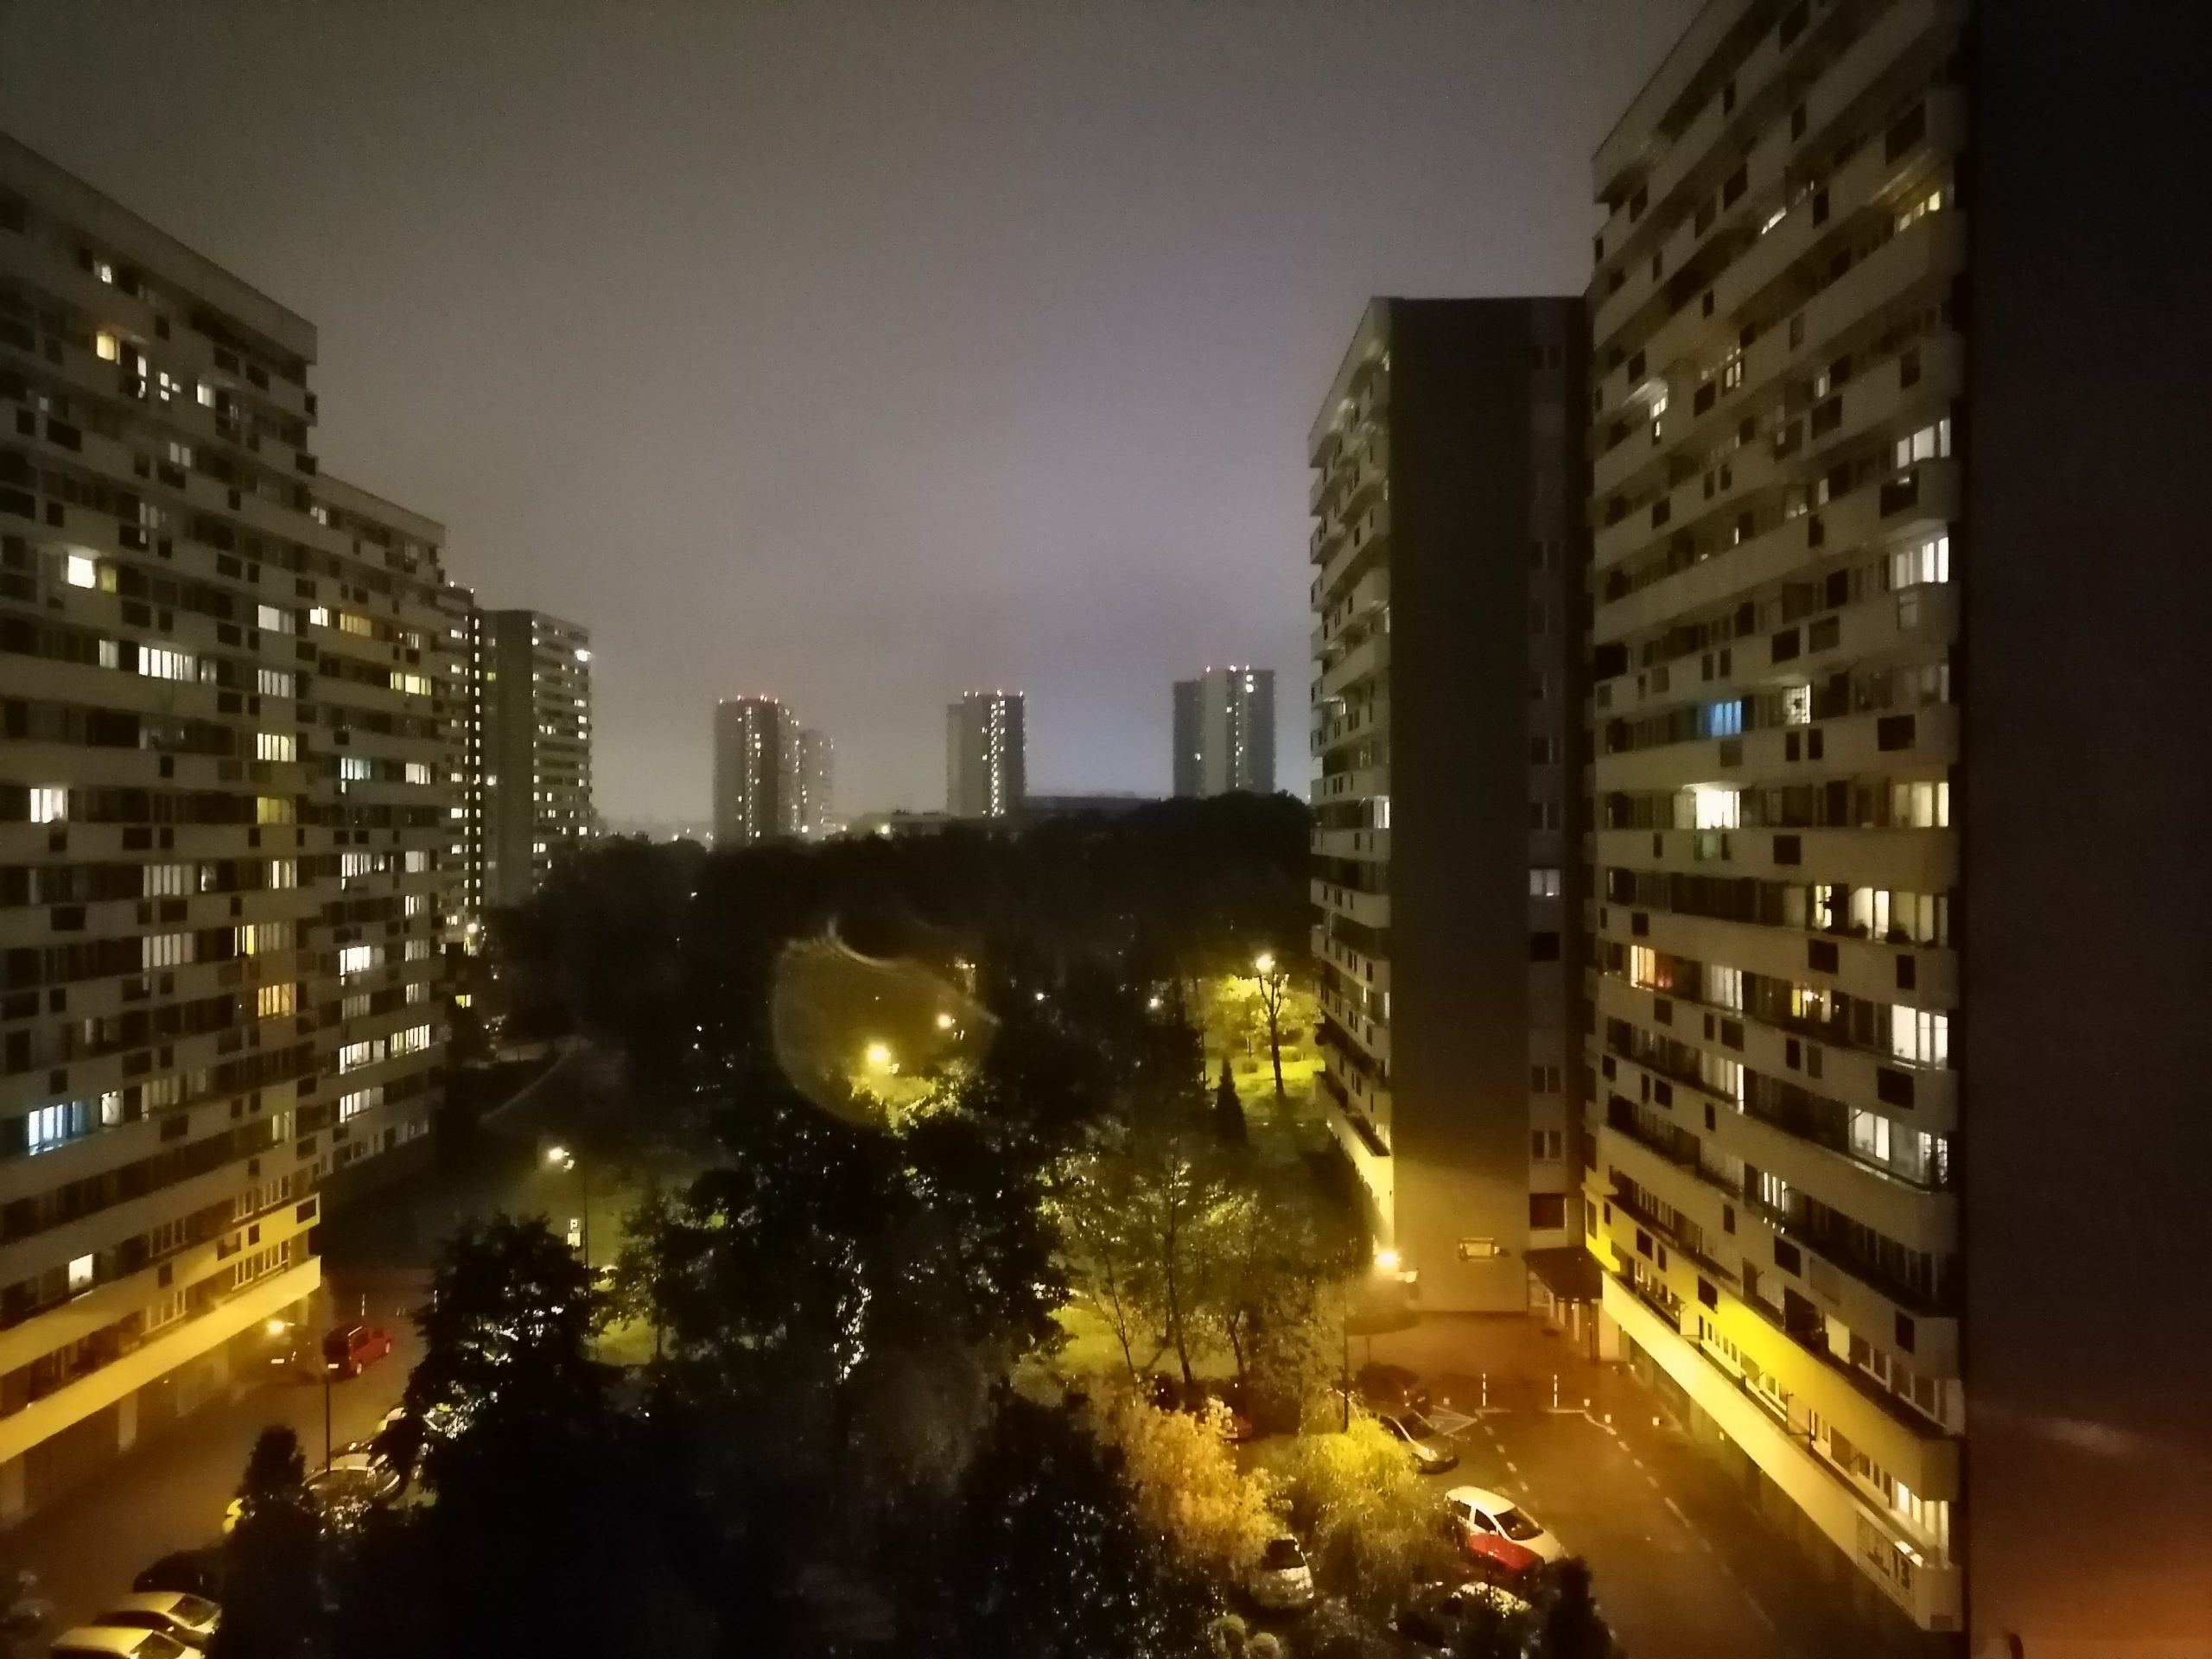 Zdjęcia nocne - Huawei P Smart 2021